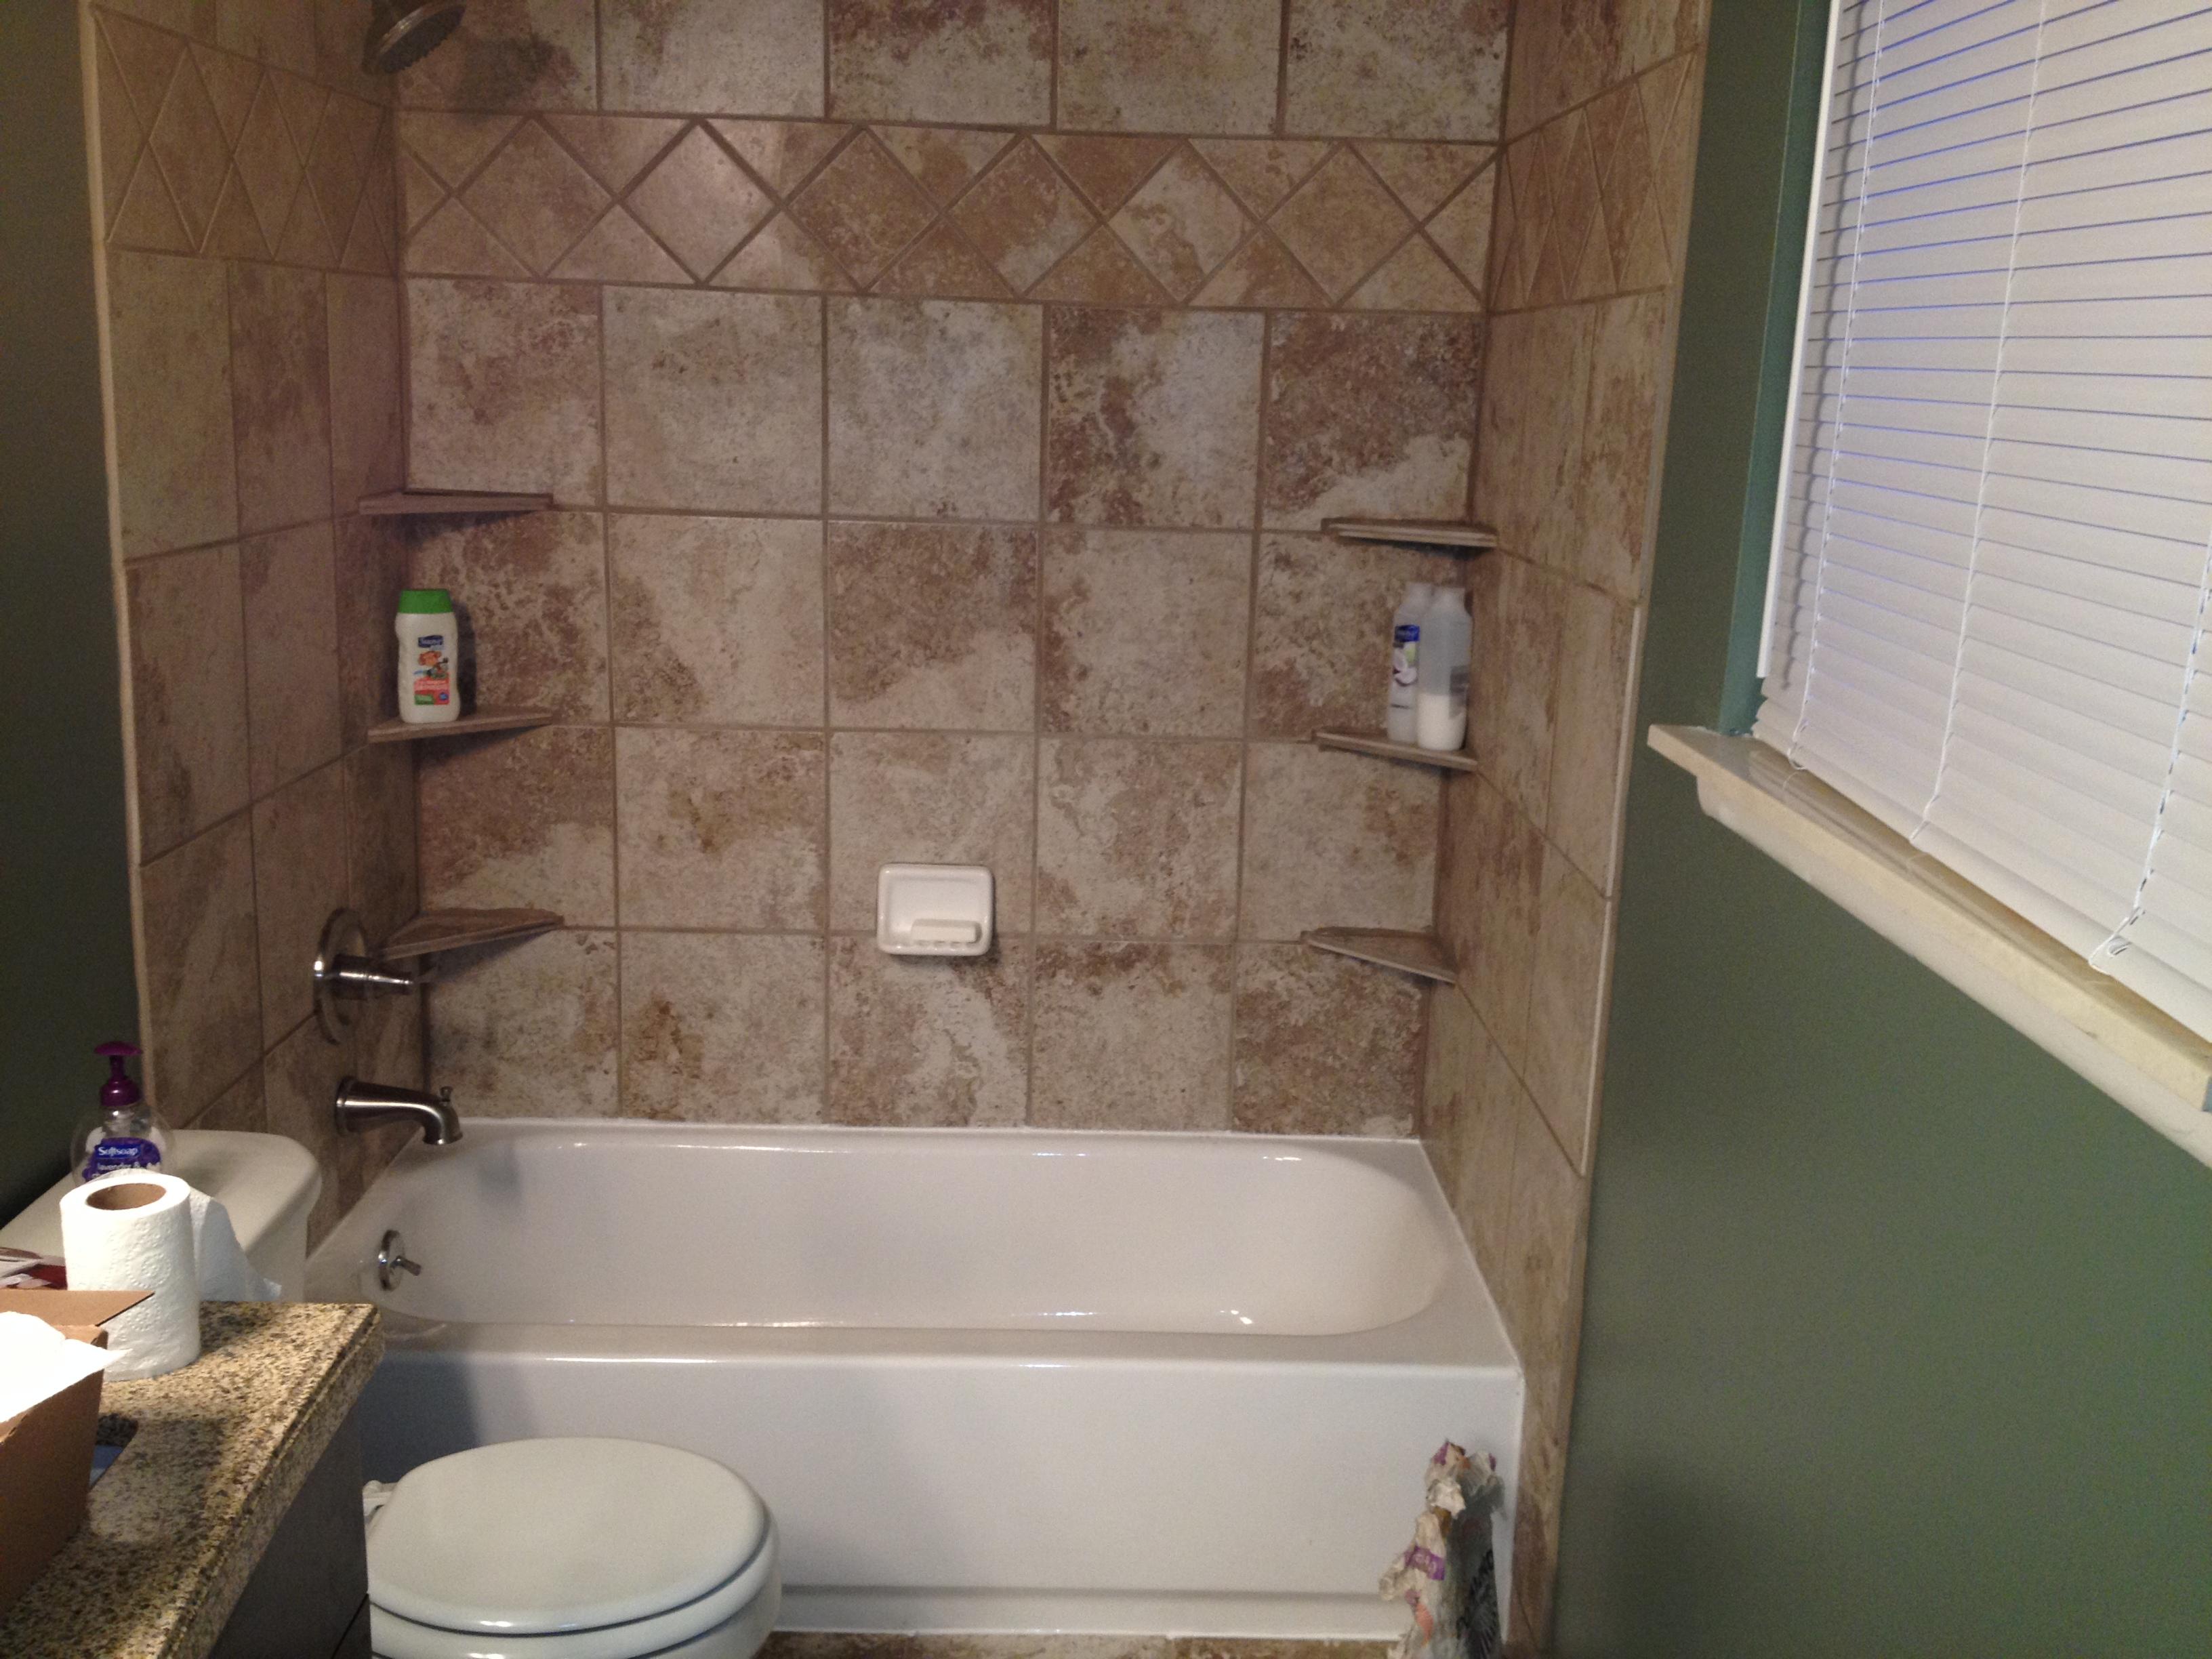 shower tub surround white tile advice. Black Bedroom Furniture Sets. Home Design Ideas